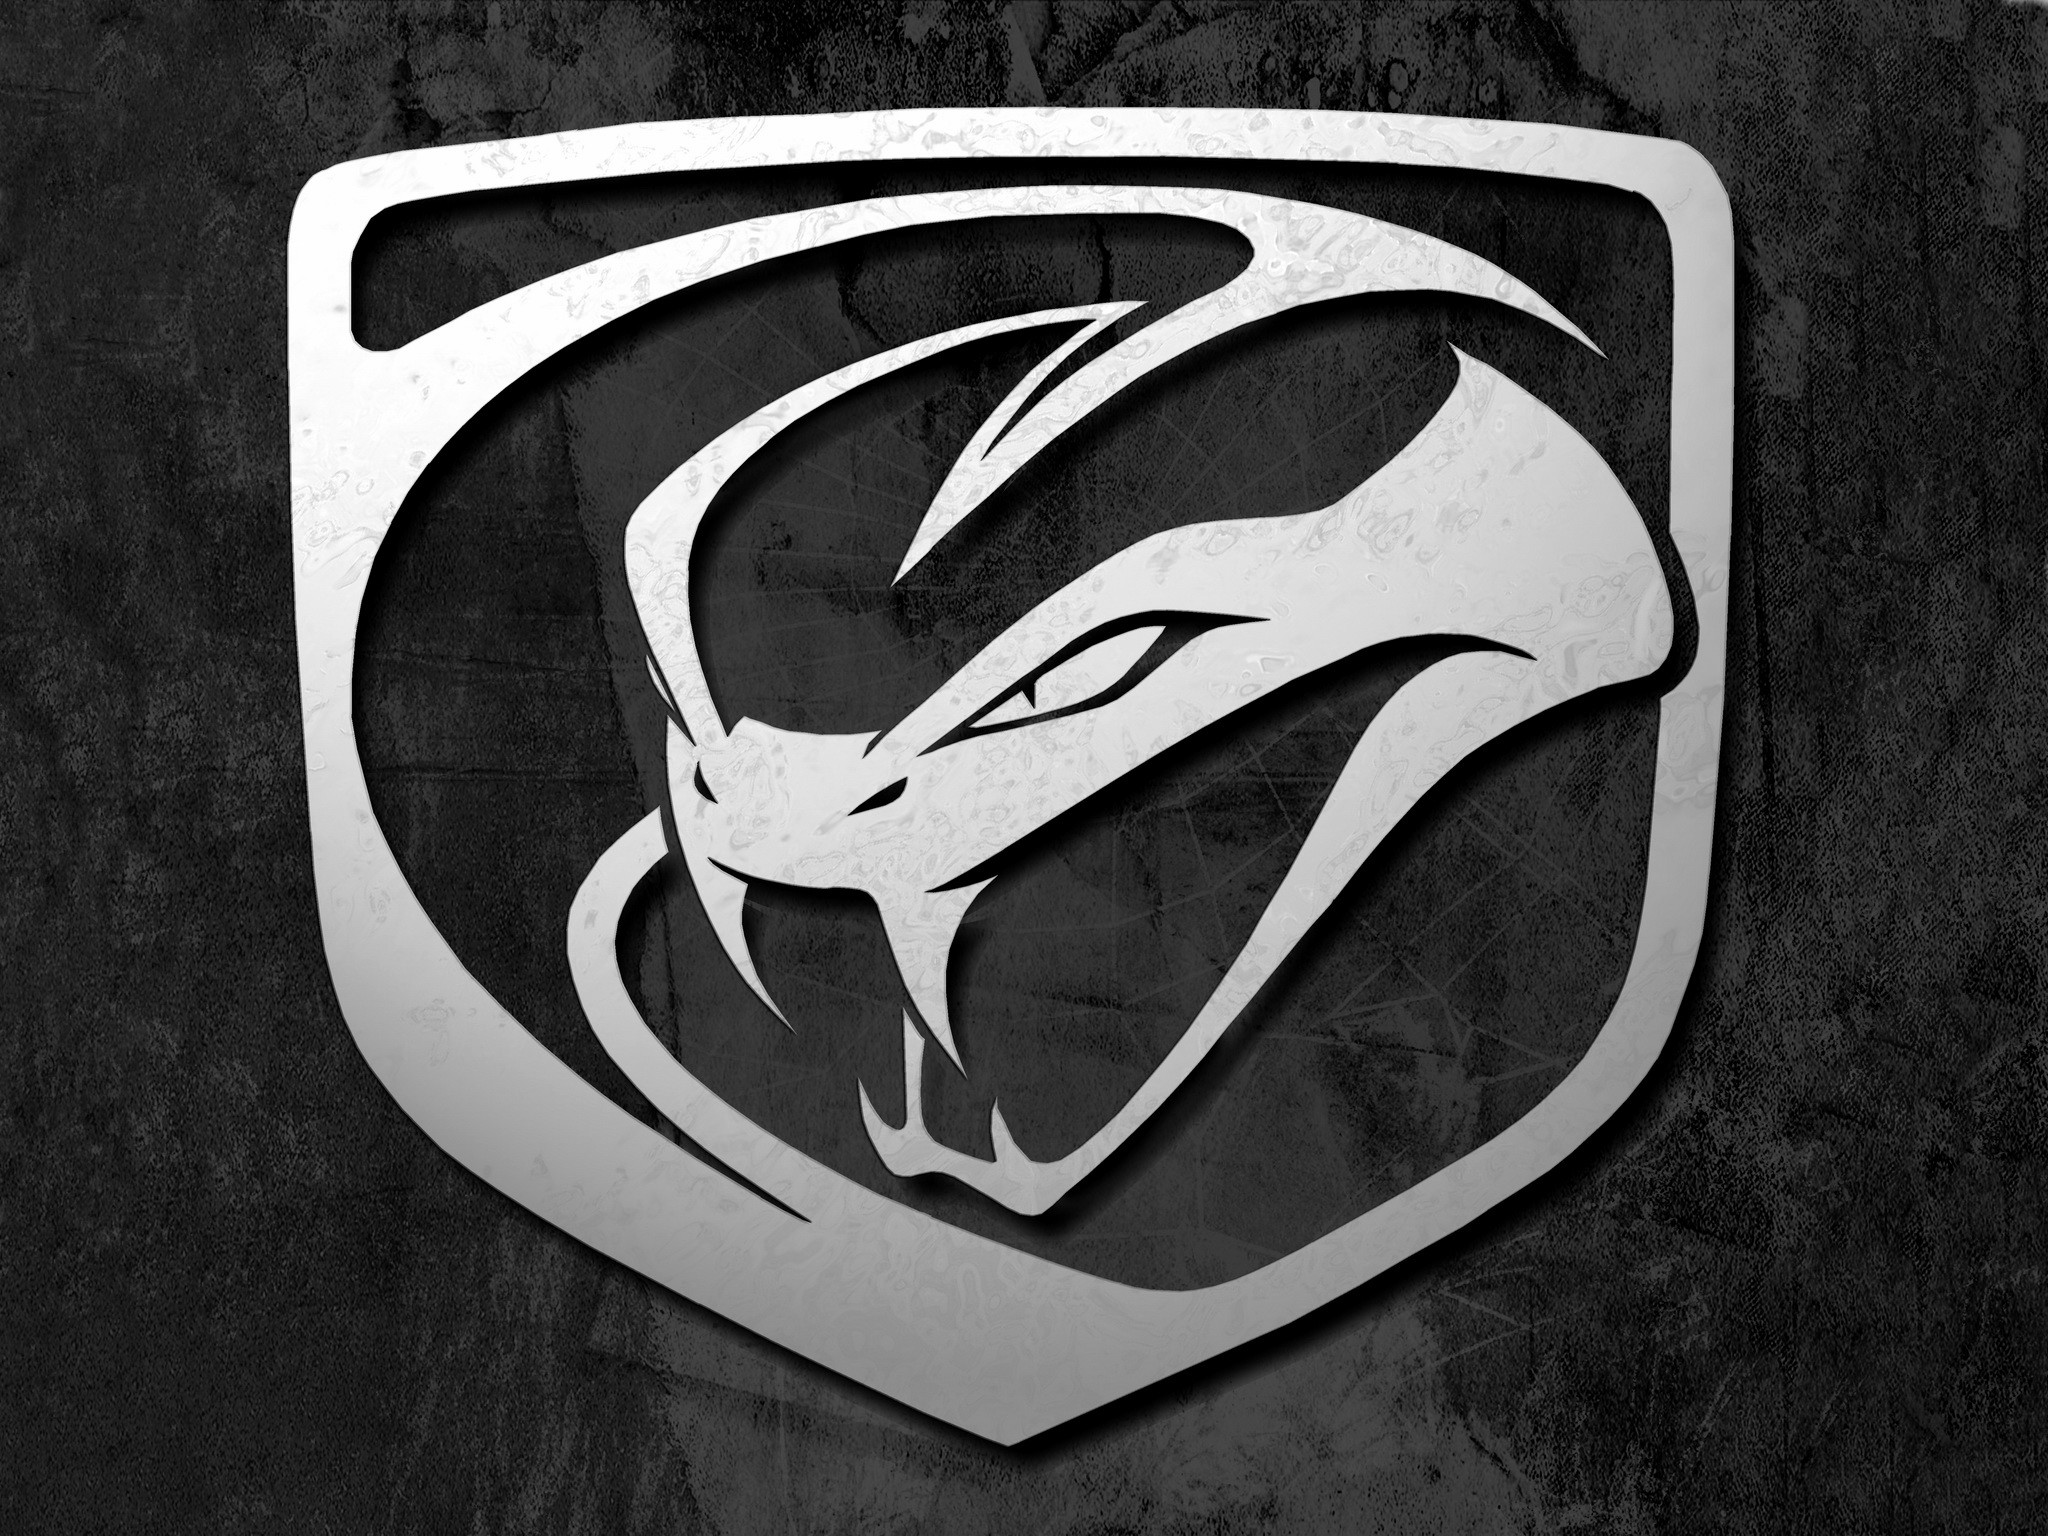 Srt Logo Wallpaper 81 images